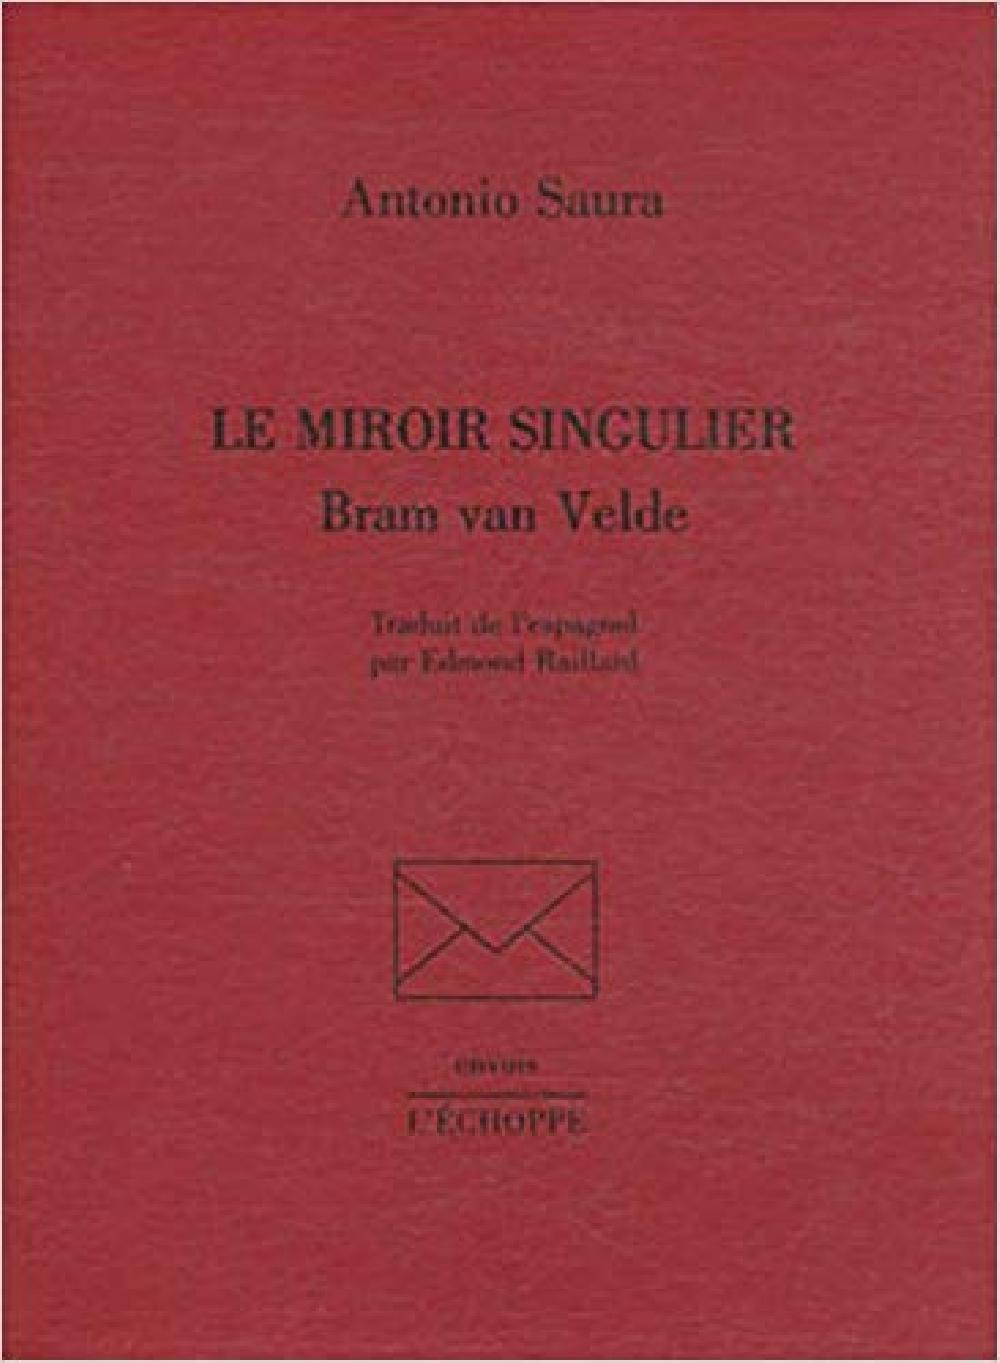 Le miroir singulier - Bram van Velde